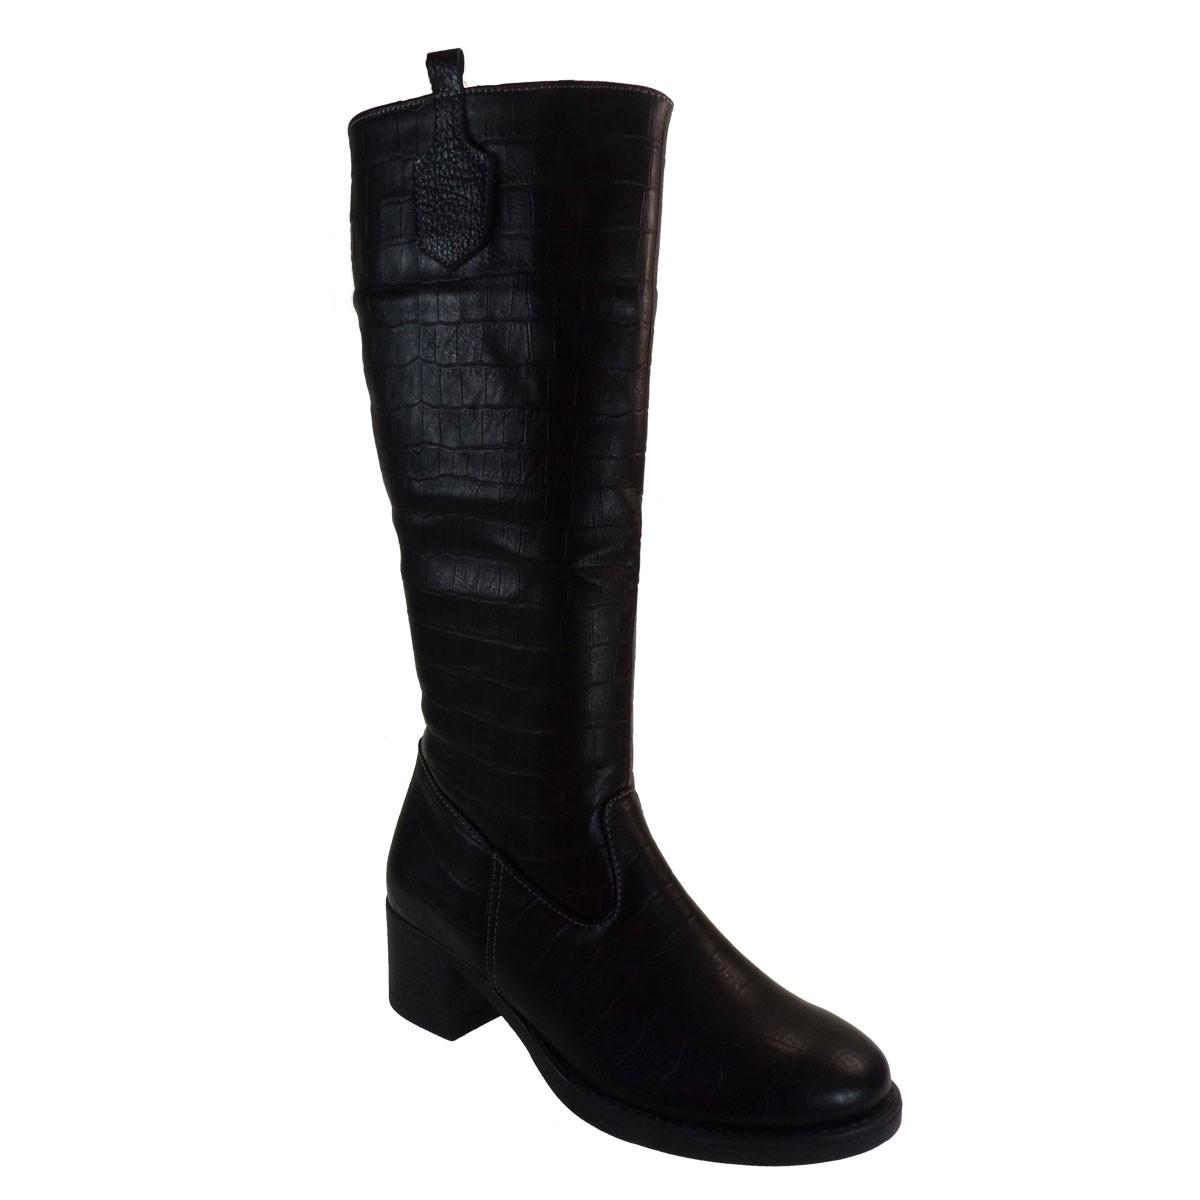 Katia shoes Γυναικεία Παπούτσια Μπότες Α73-Β Μαύρο Κροκό